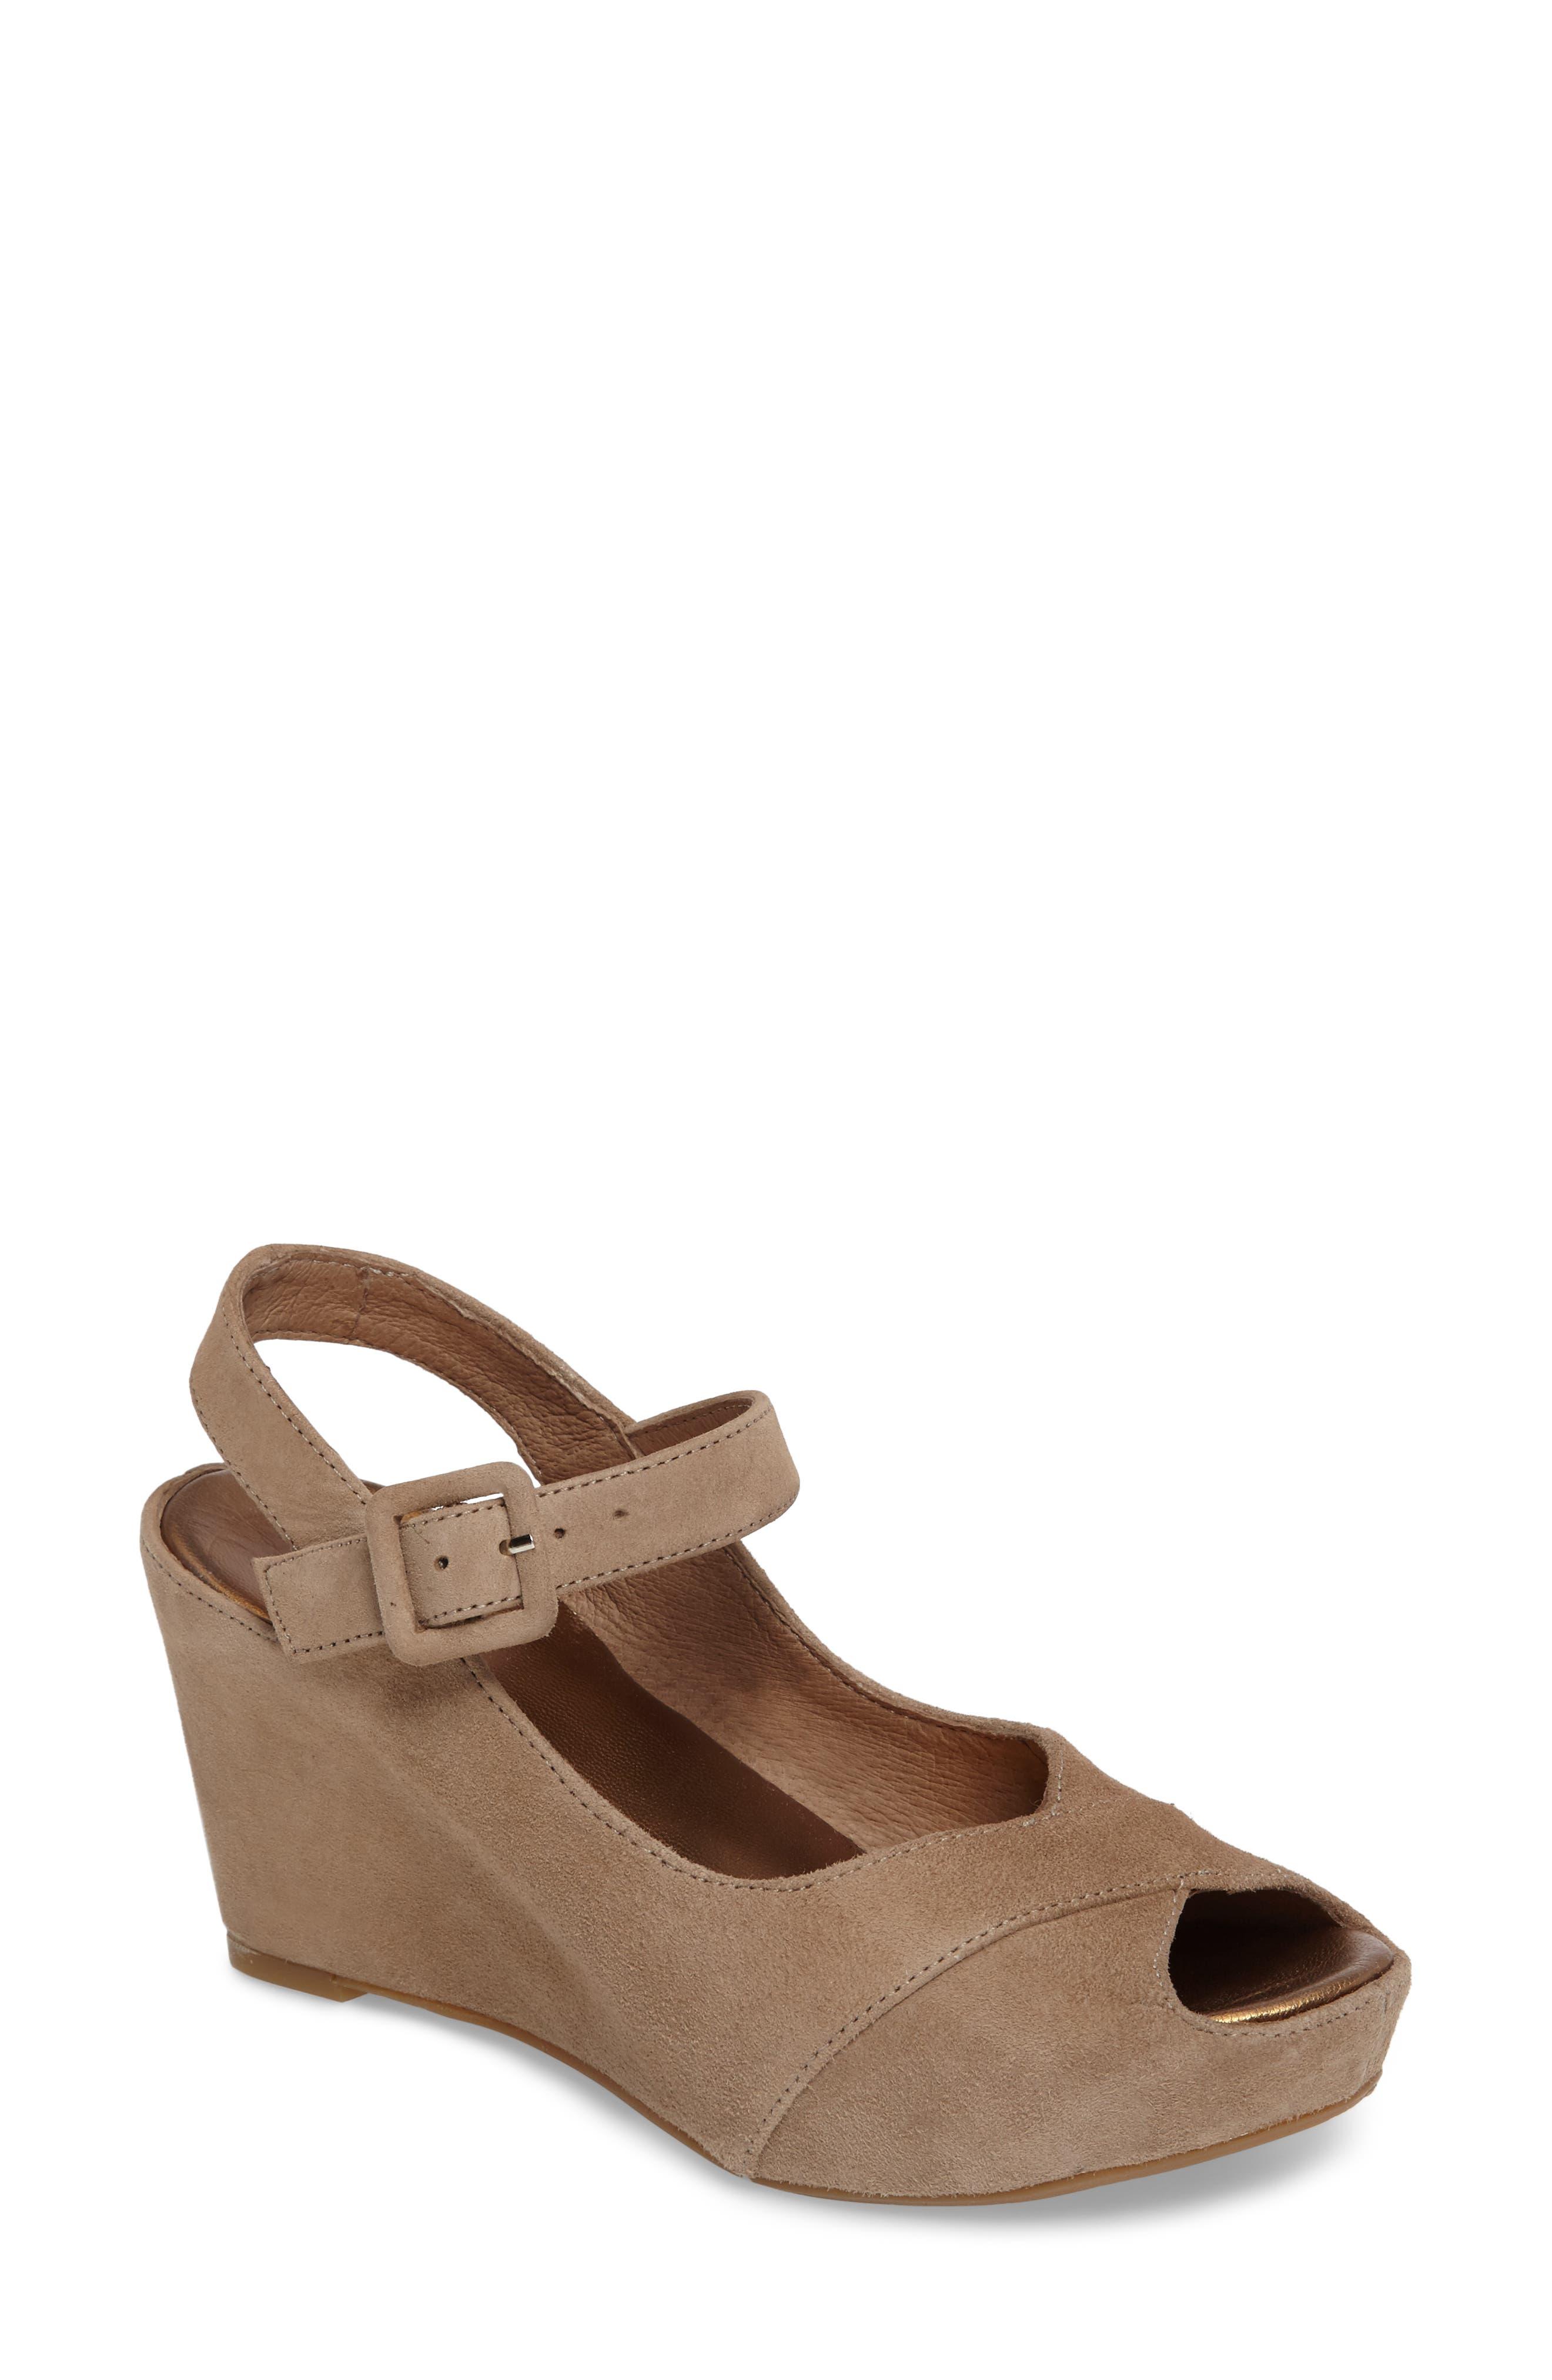 Tara Platform Wedge Sandal,                             Main thumbnail 1, color,                             Taupe Suede